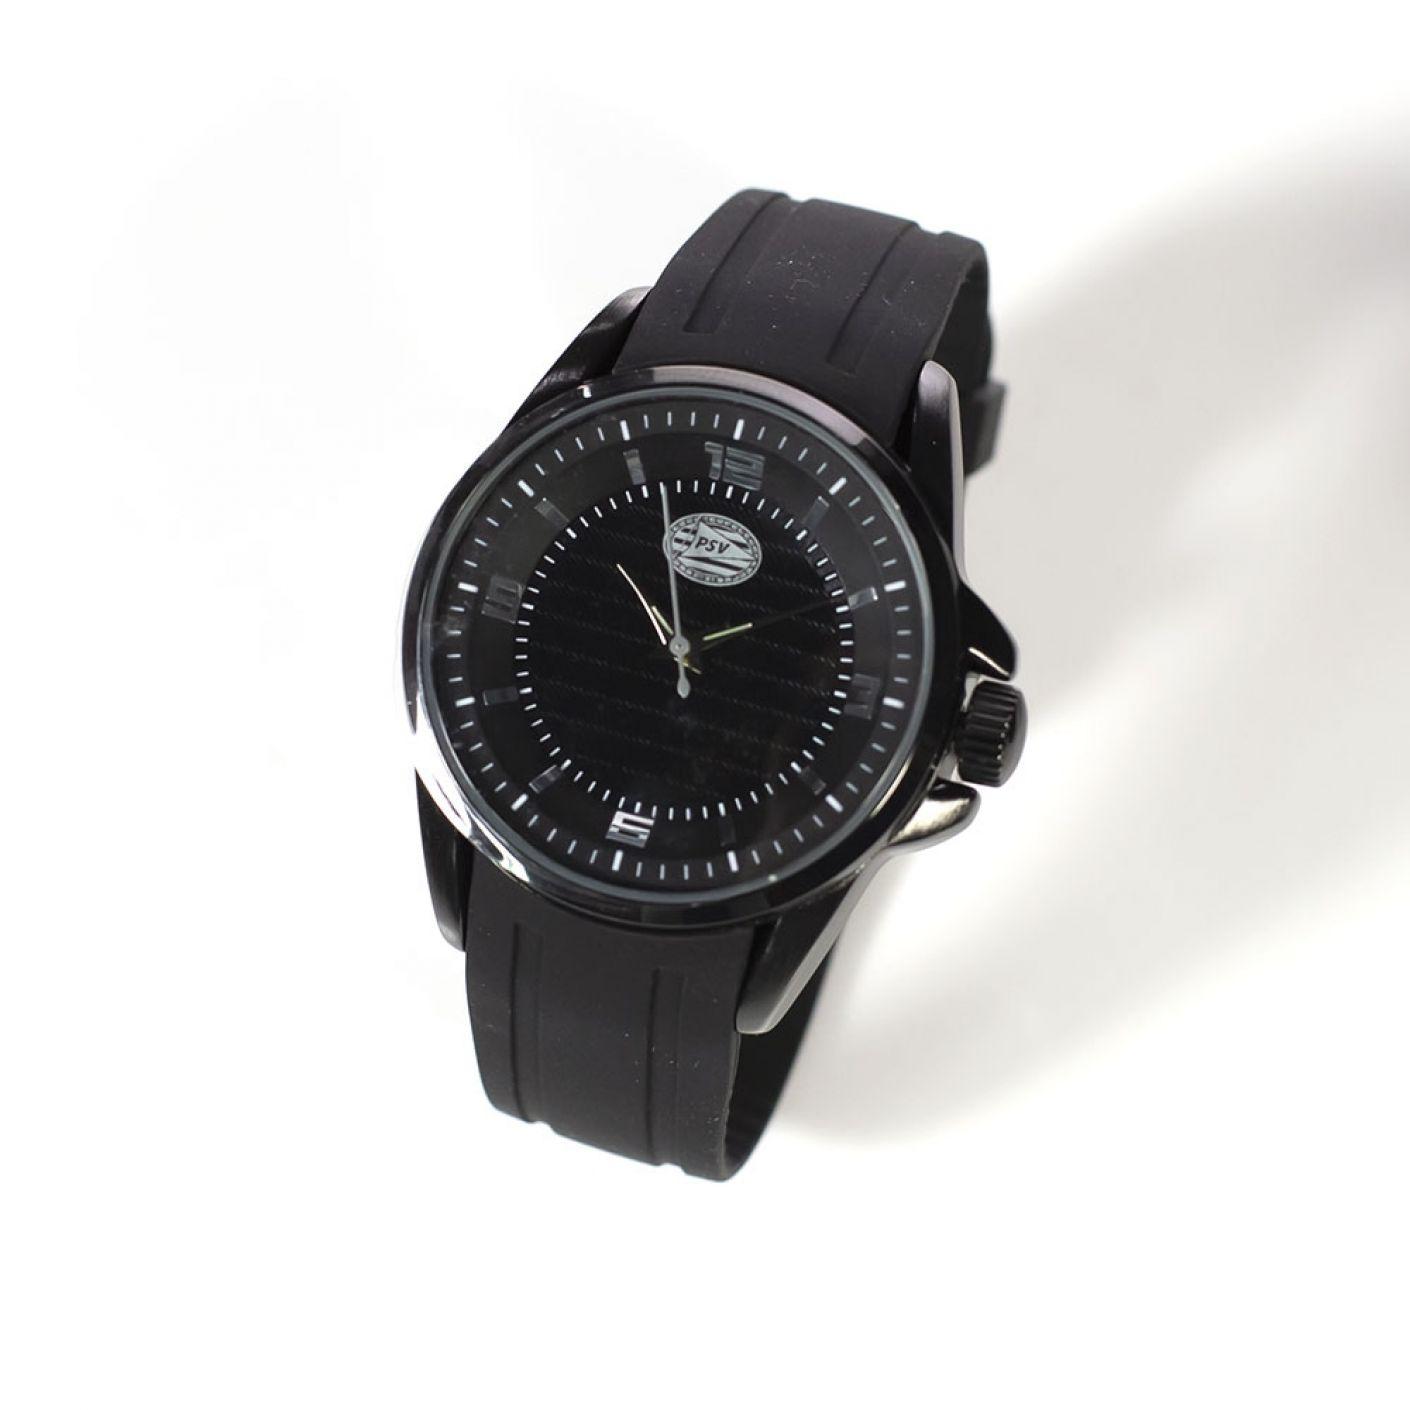 PSV Heren Horloge + Giftbox